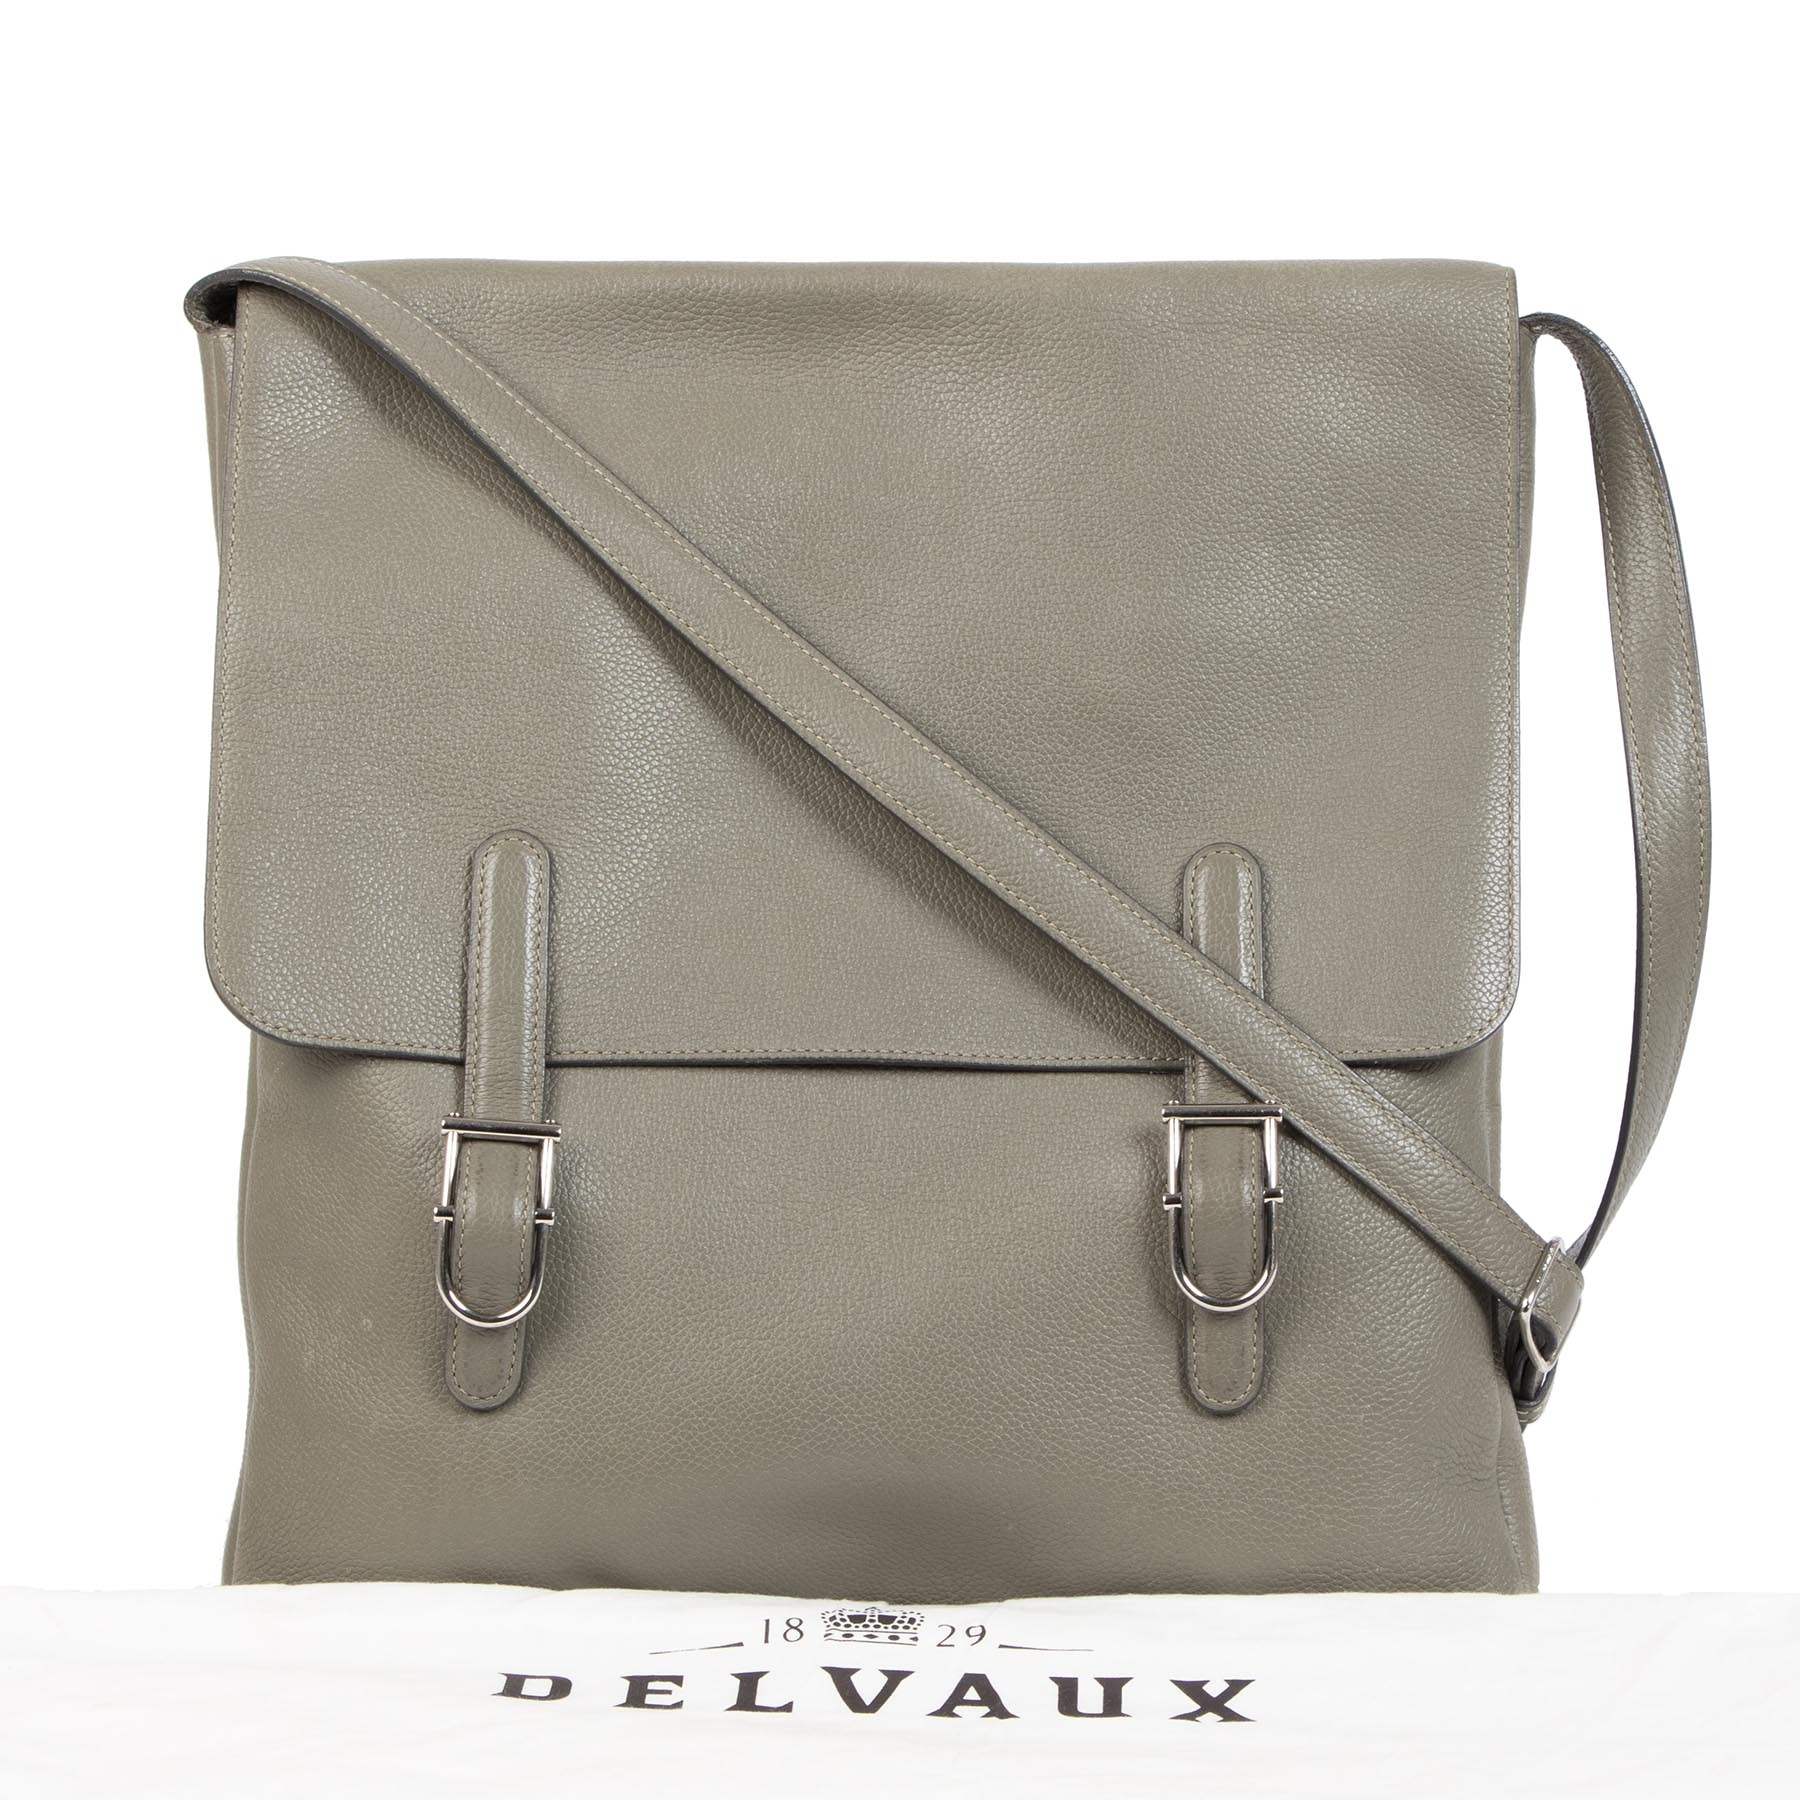 Authentieke tweedehands vintage Delvaux Kot Kot Messenger Bag koop online webshop LabelLOV